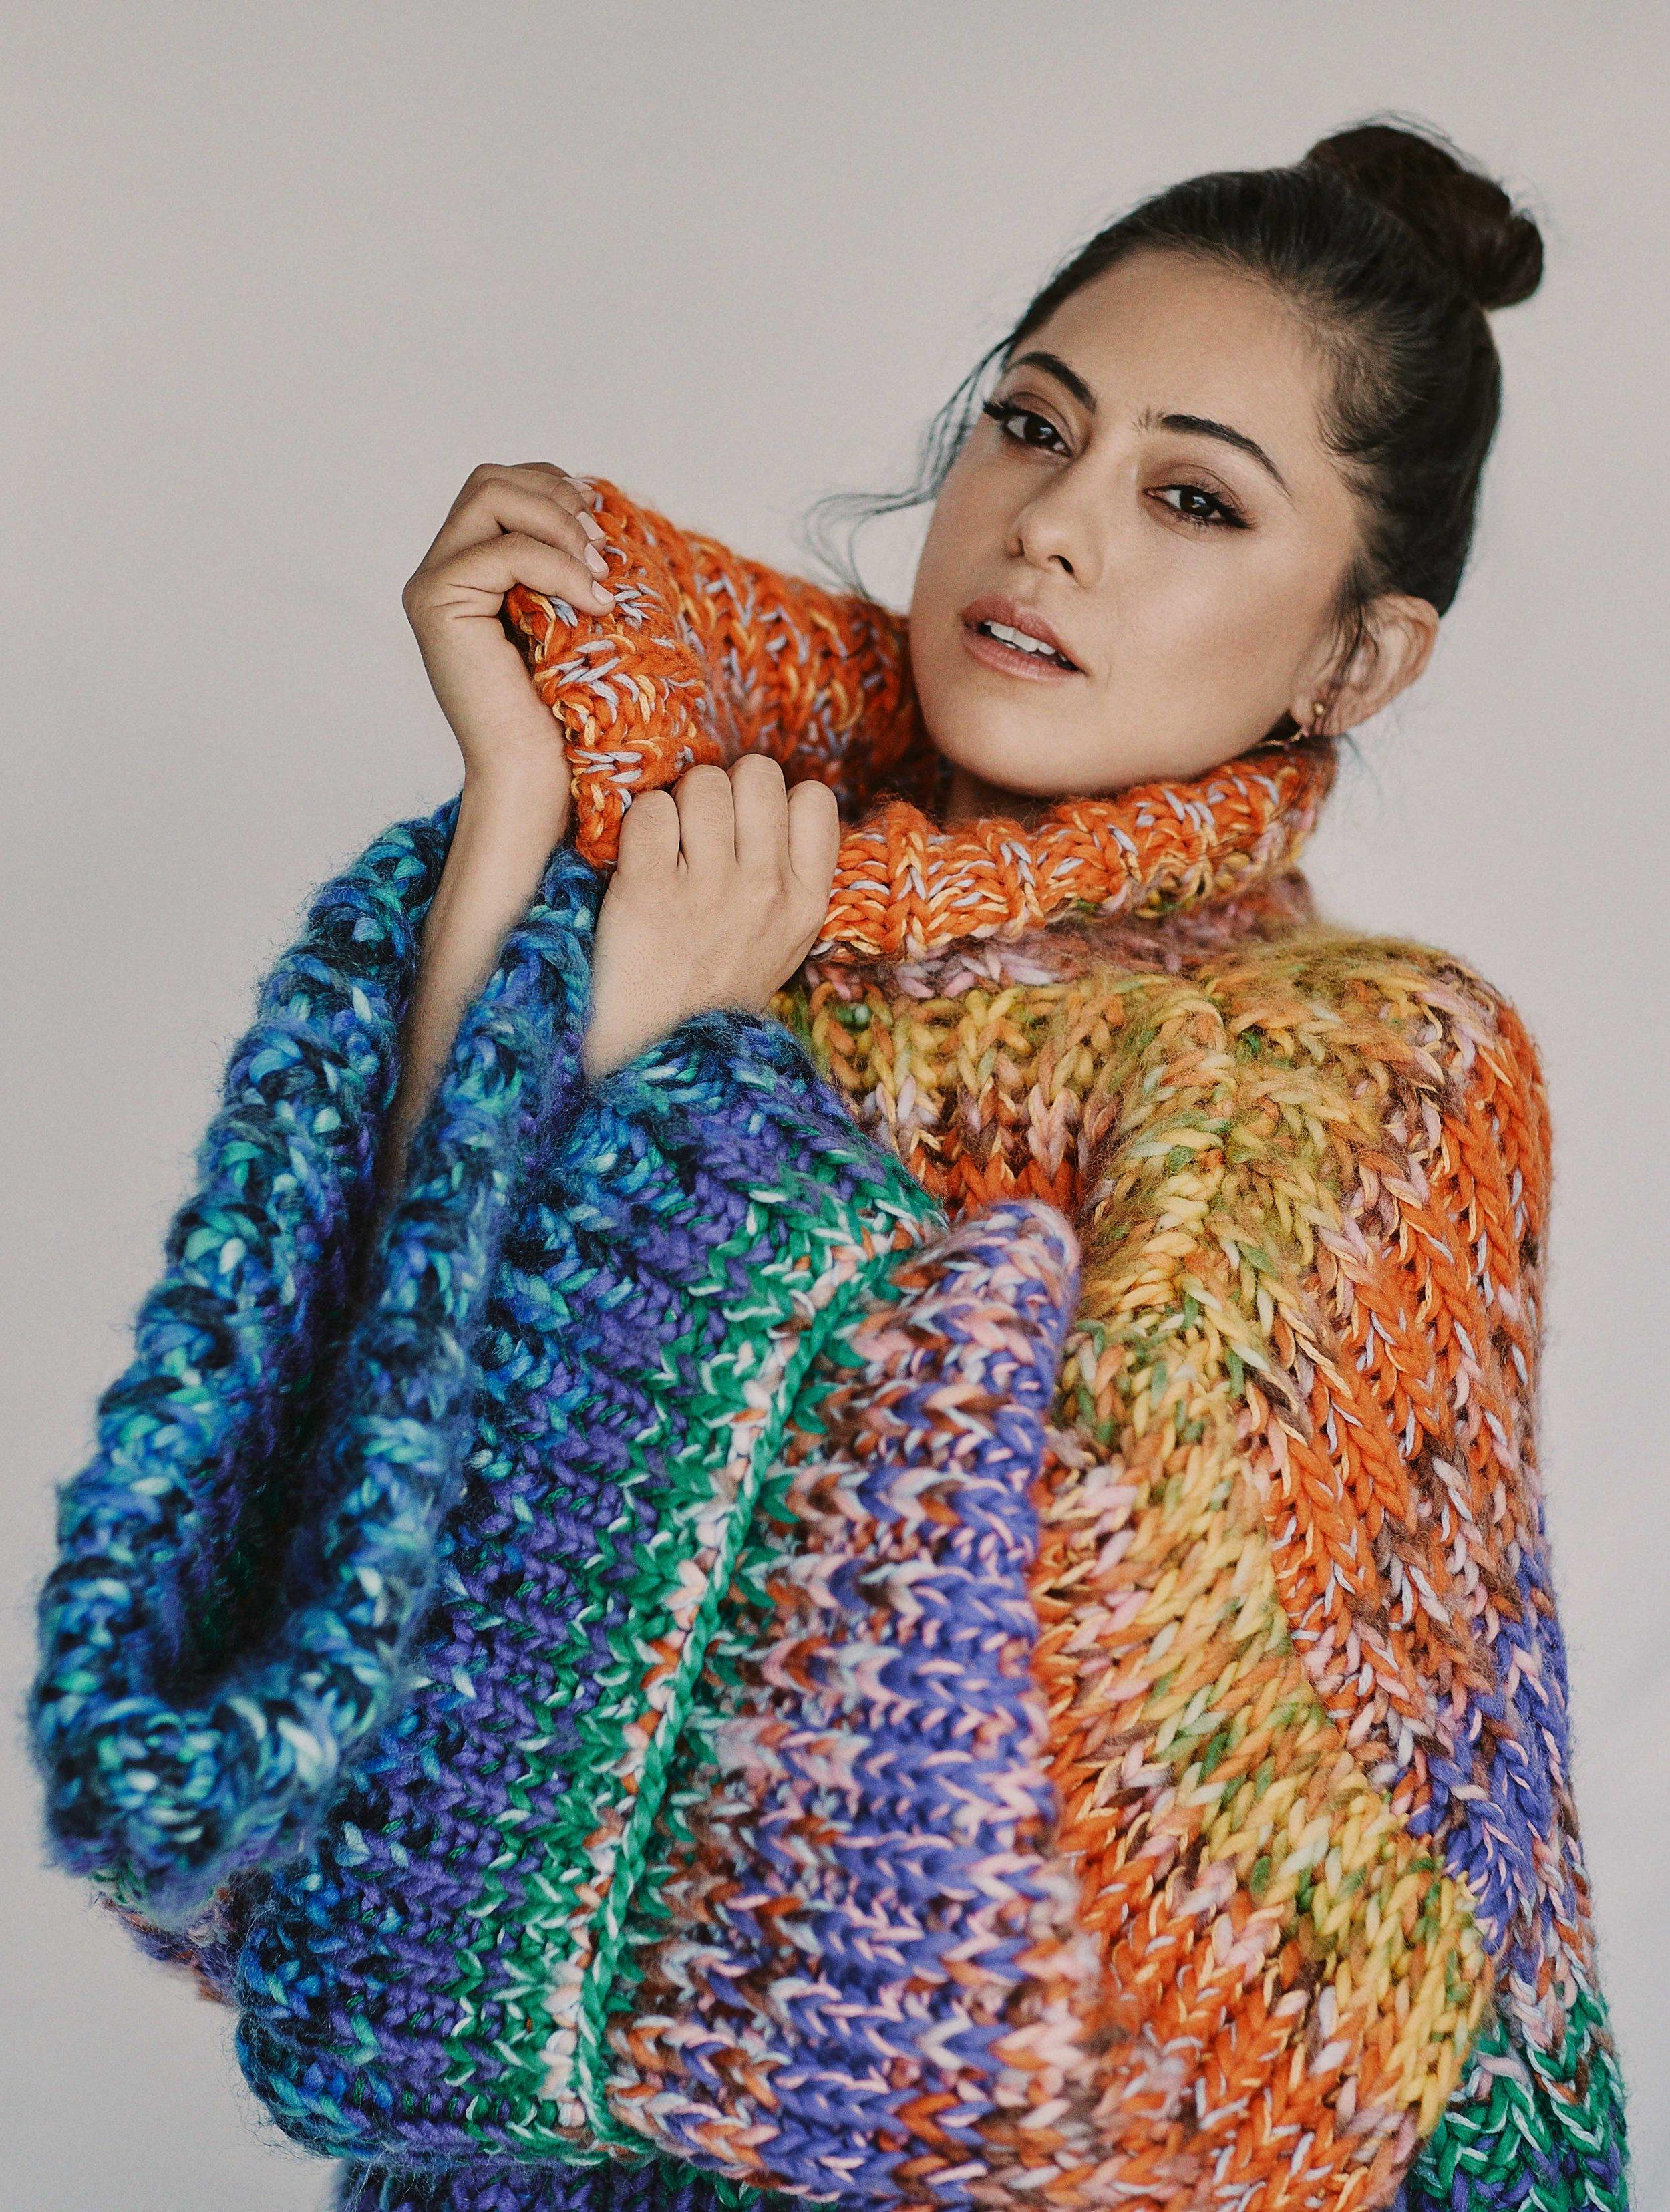 Rosa Salazar for Nexos Magazine Februrary/March 2019 Issue Styled by Natalie Hoselton